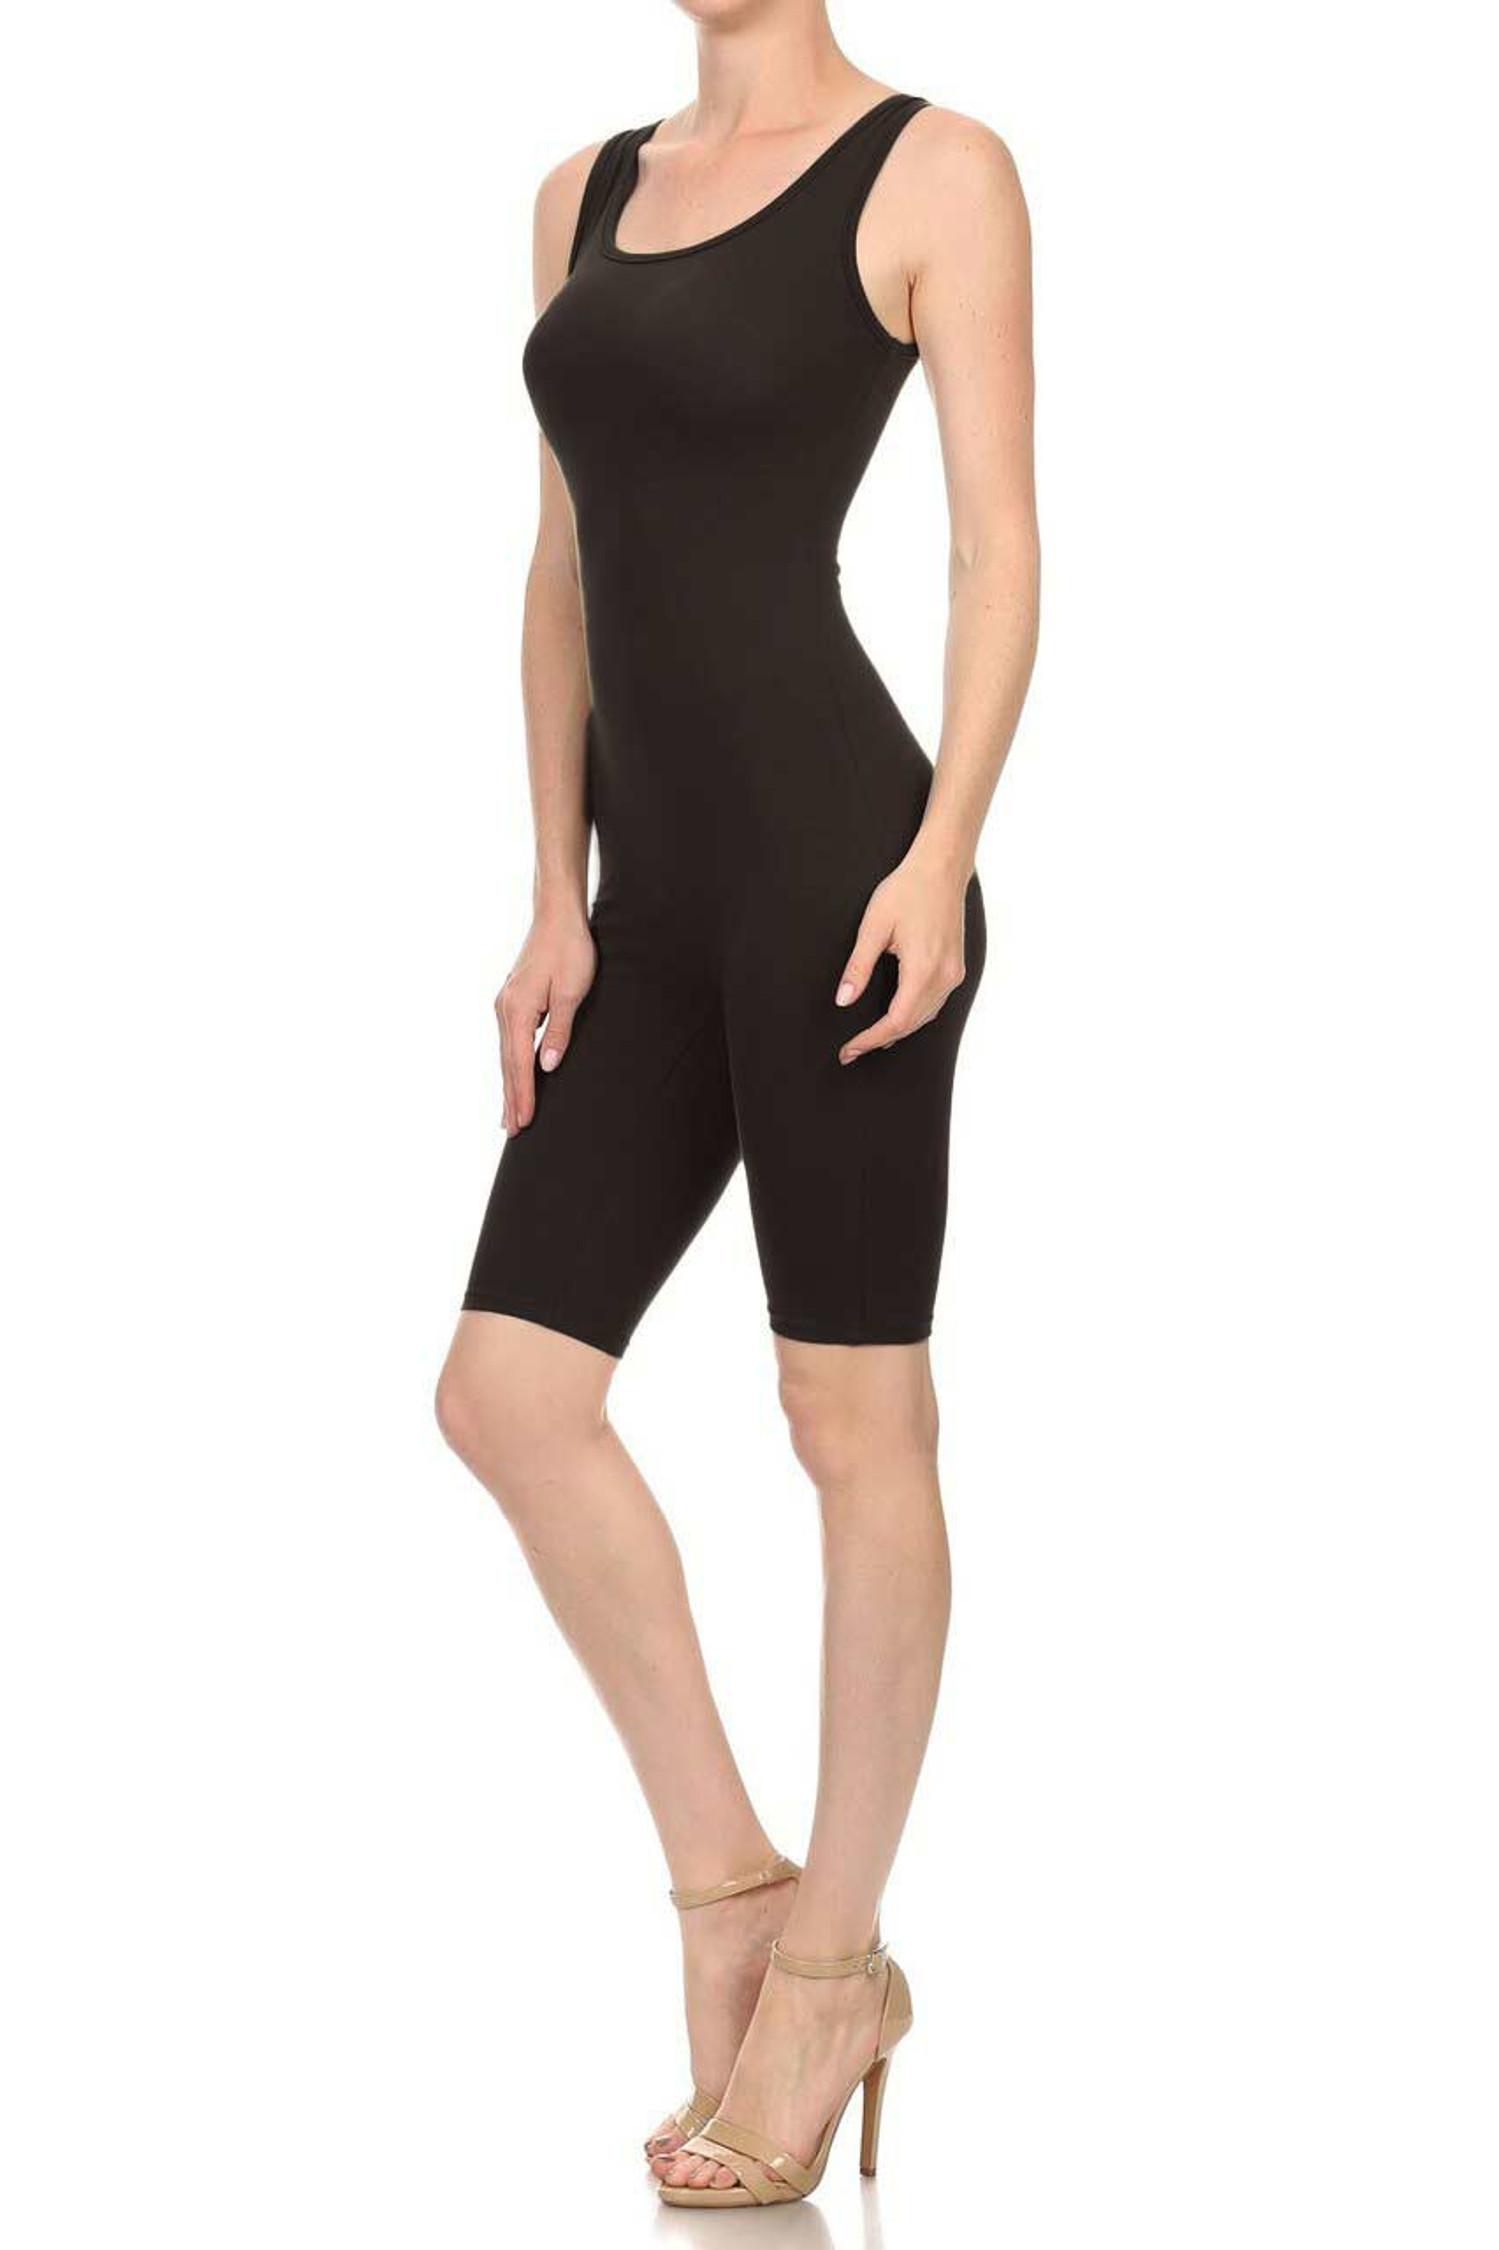 Black USA Basic Cotton Thigh High Jumpsuit